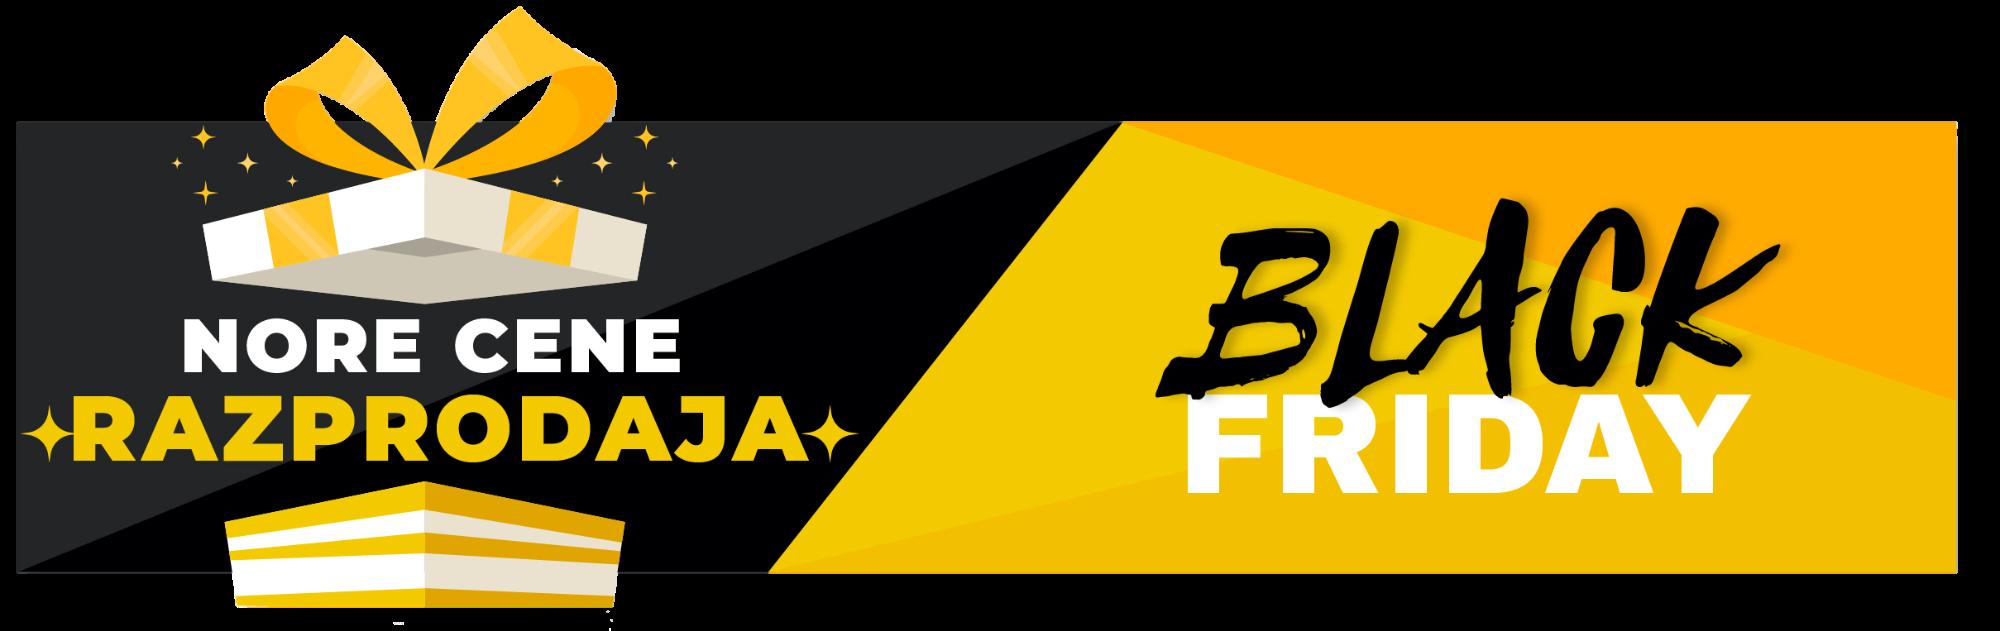 BLACK_FRIDAY_CRNI_PETEK_WWW.DRVA.INFO-2.png